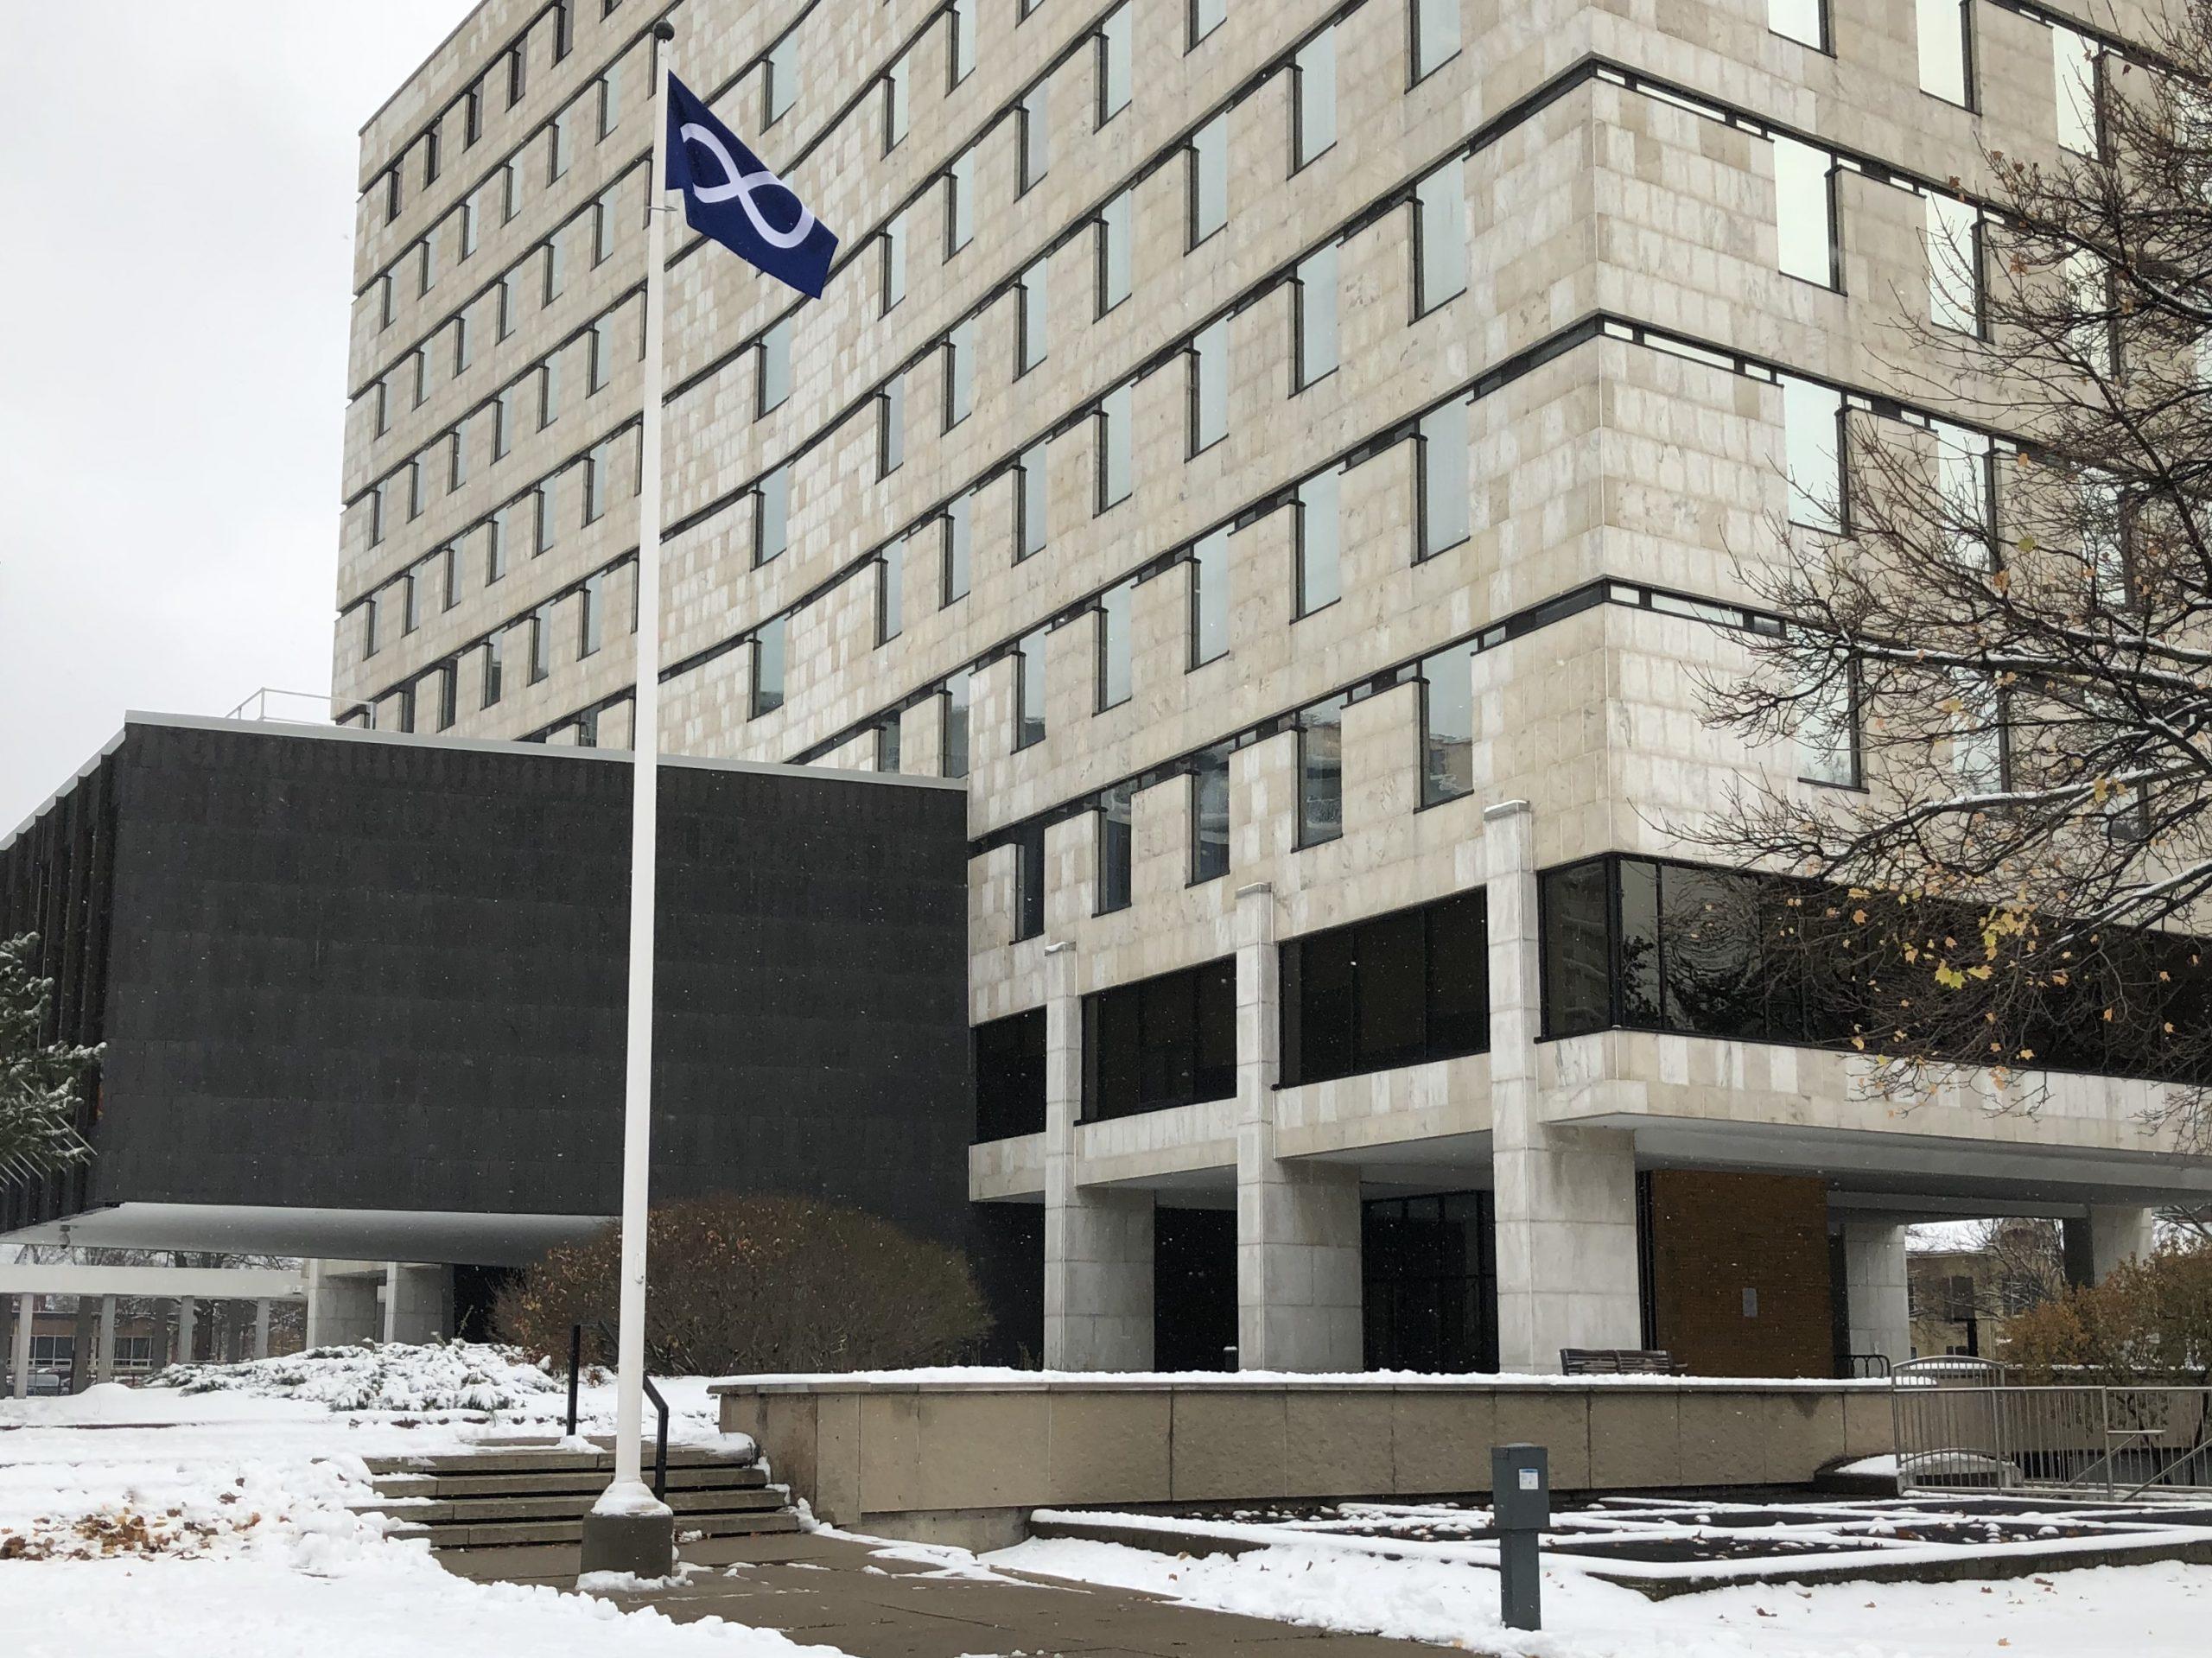 Metis flag flies high at City Hall